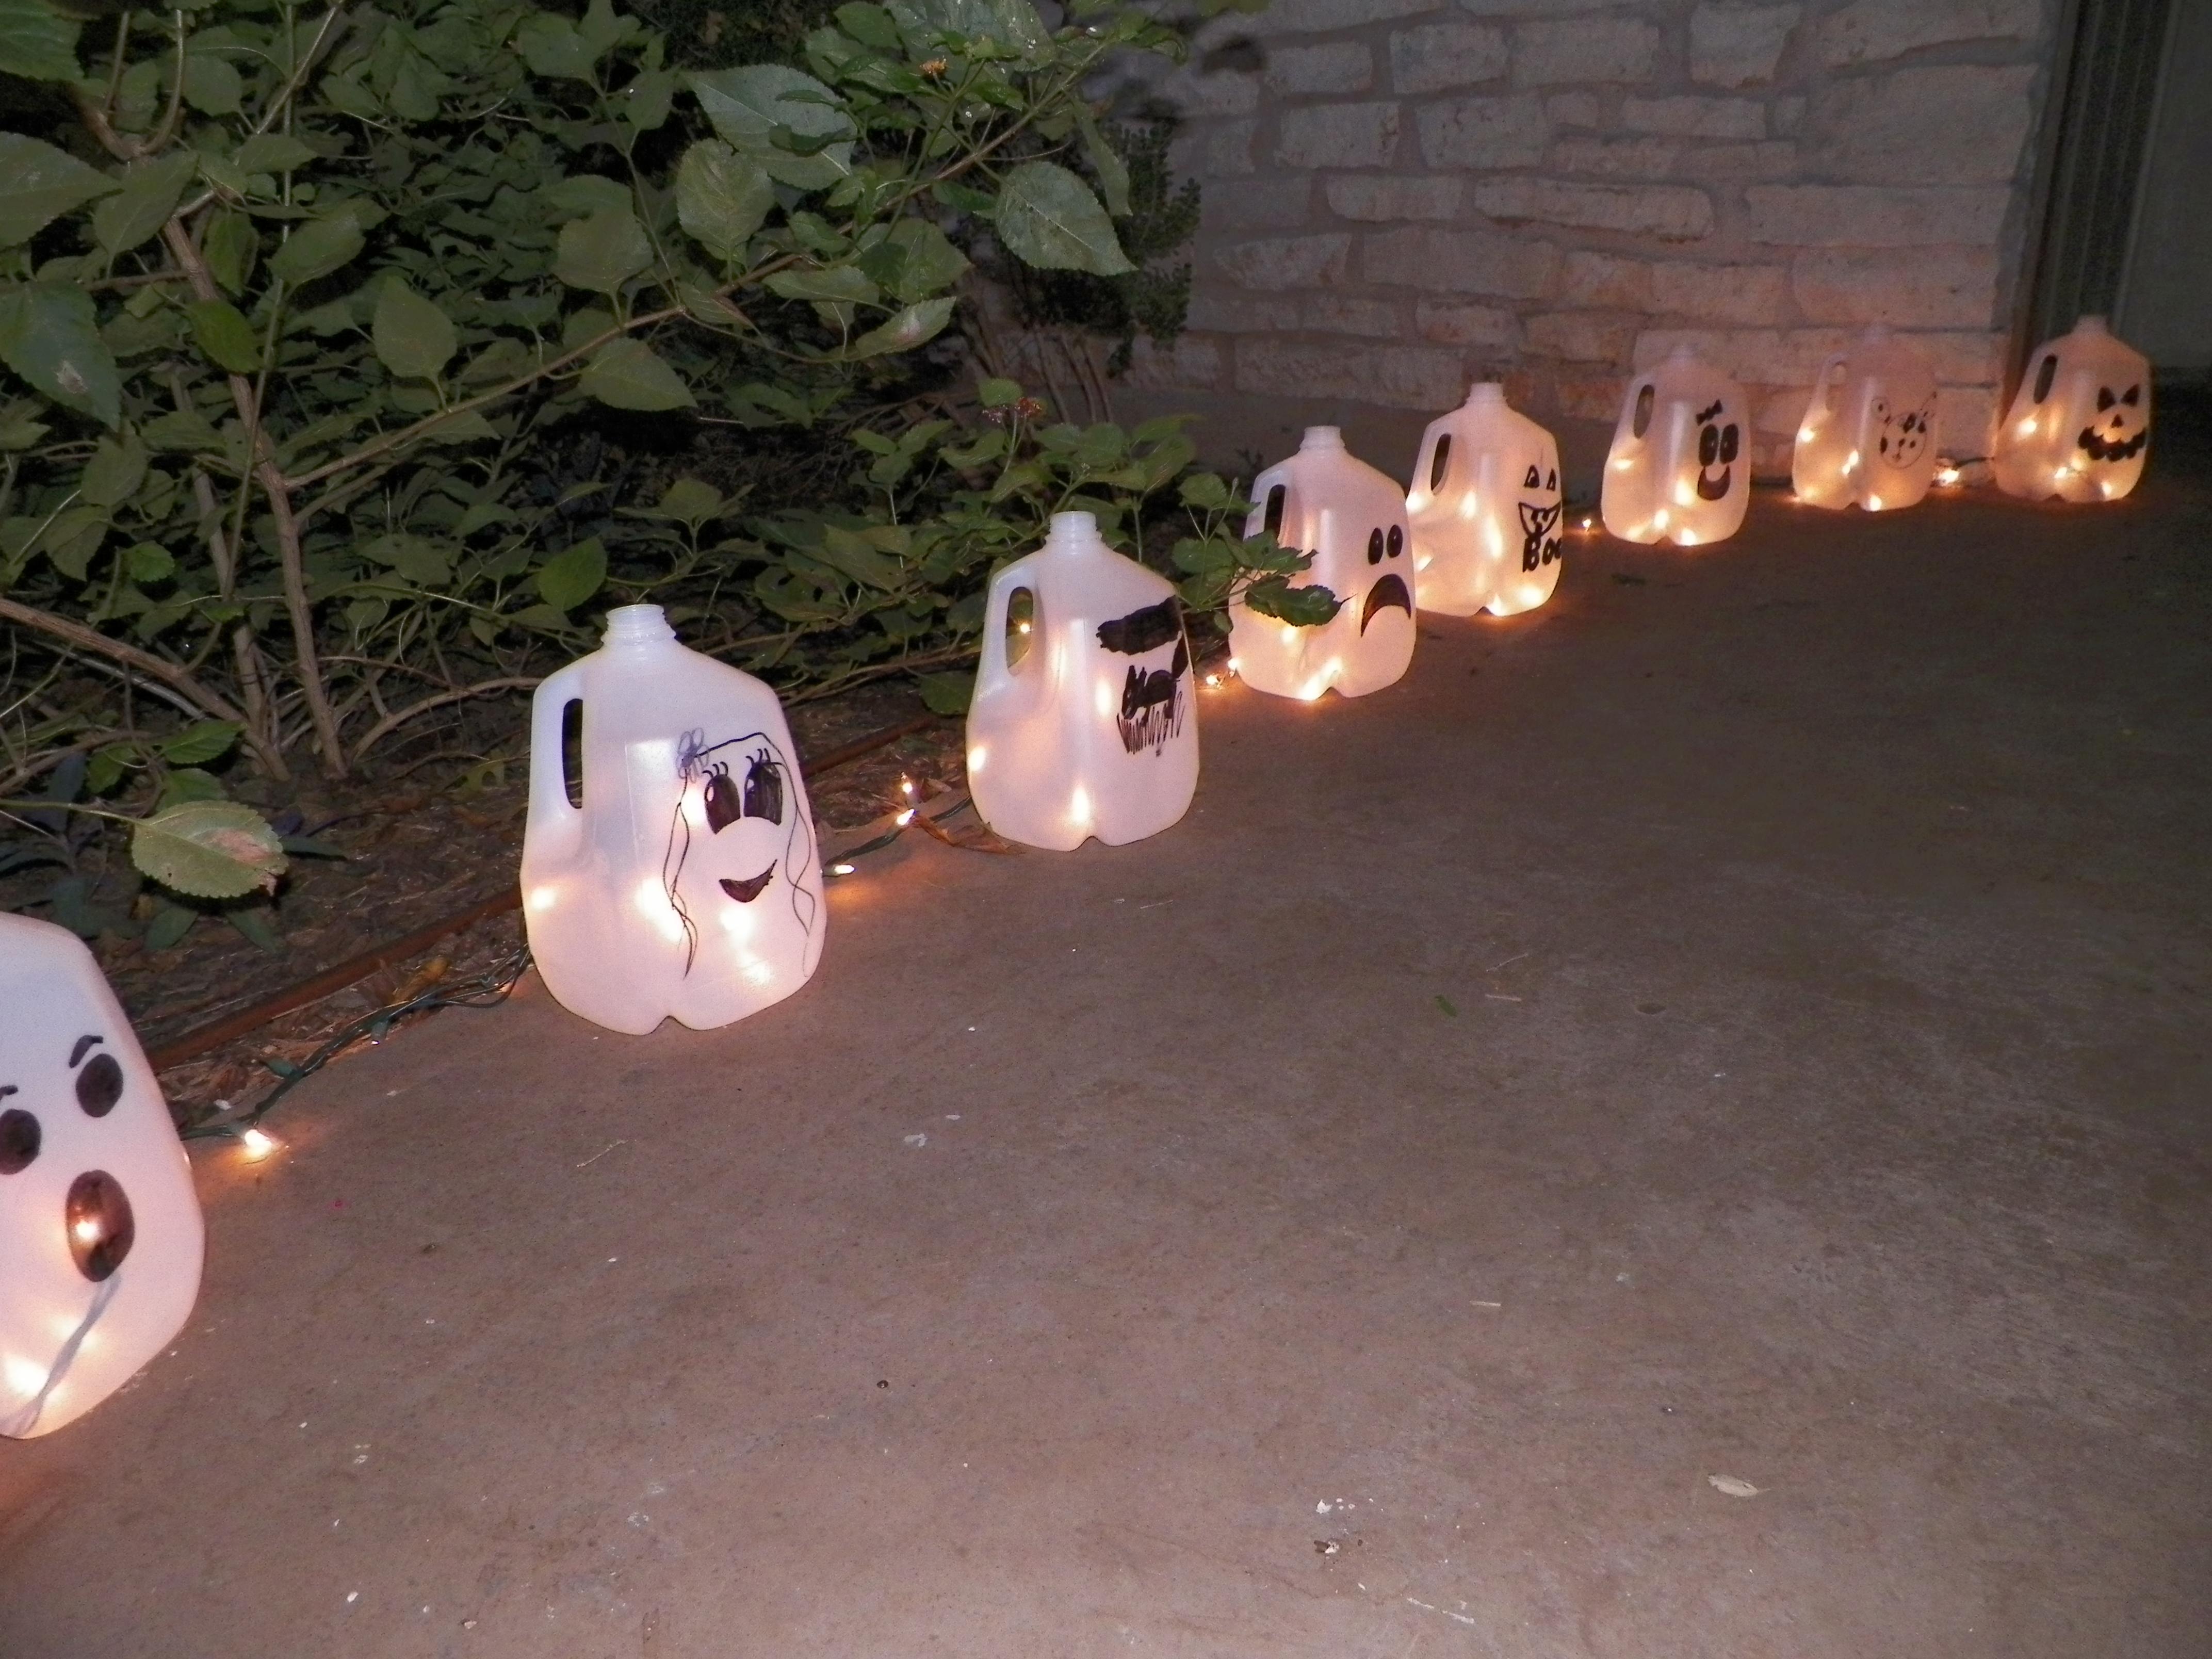 Ordinary Milk Carton Halloween Crafts Part - 8: How To Make The Milk Carton Ghosts